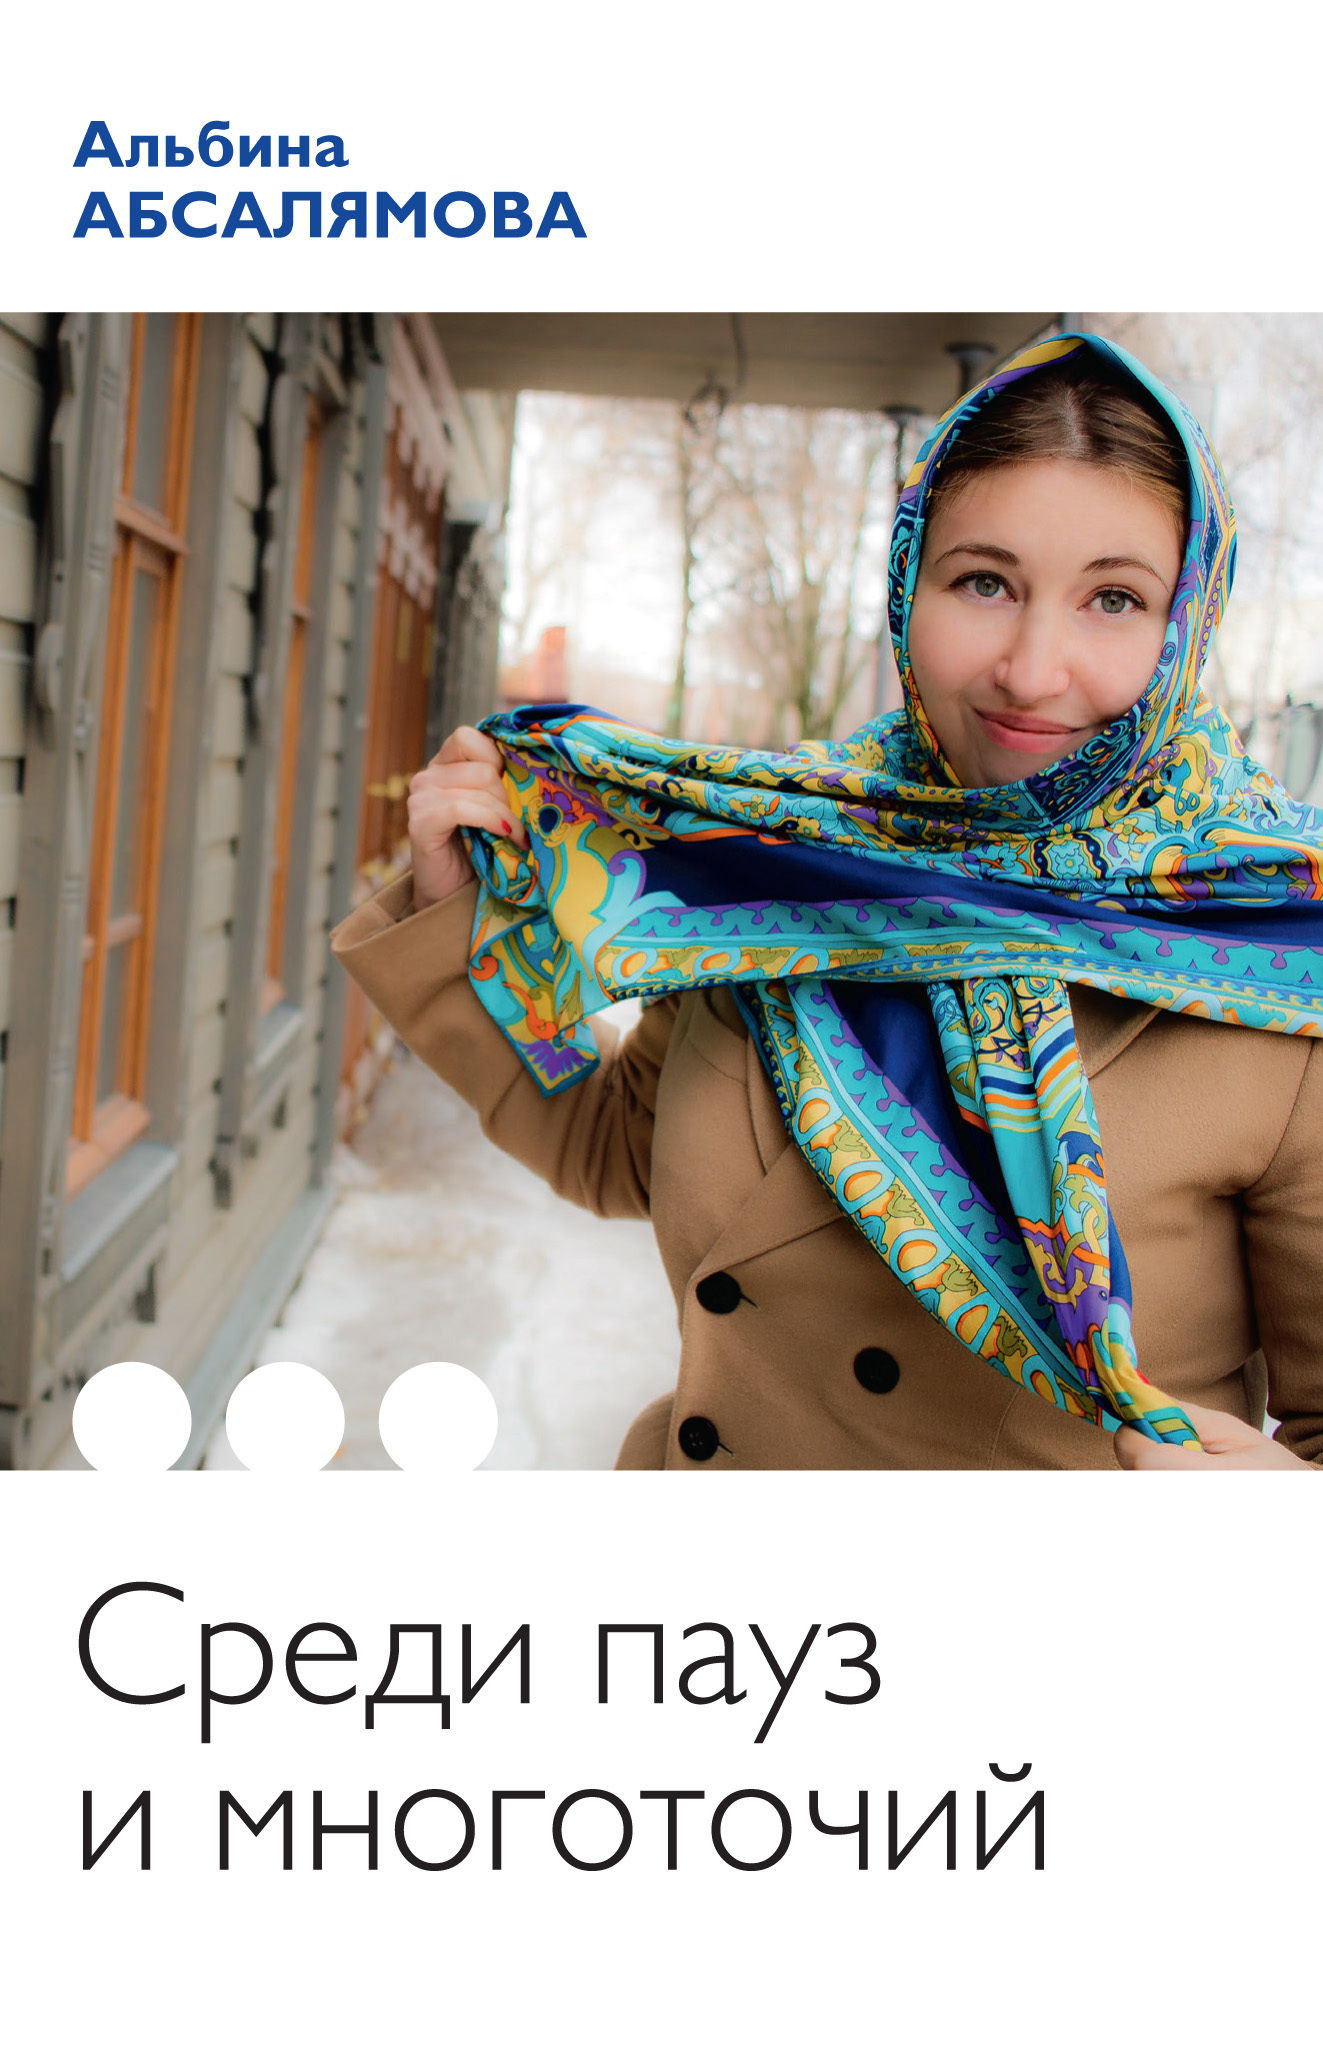 Альбина Абсалямова бесплатно